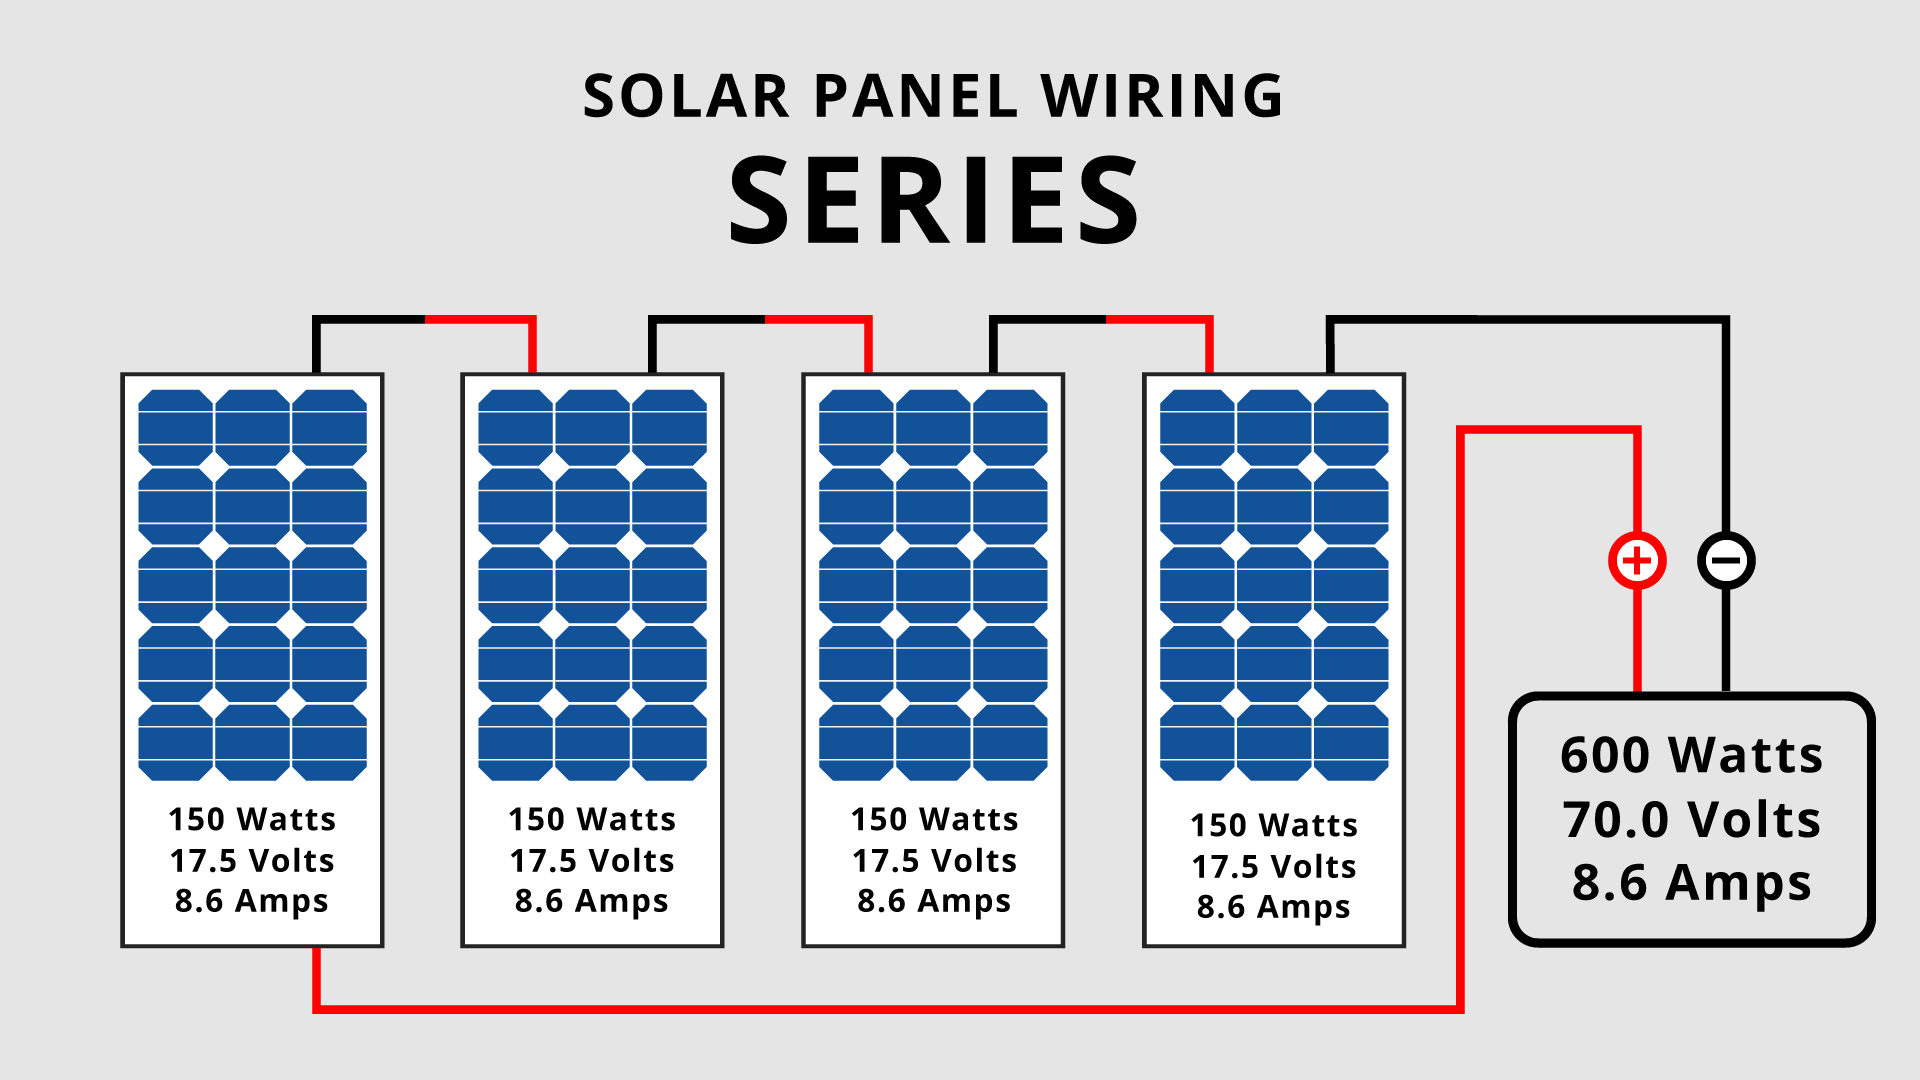 Campervan wiring diagram of solar panels wired in series